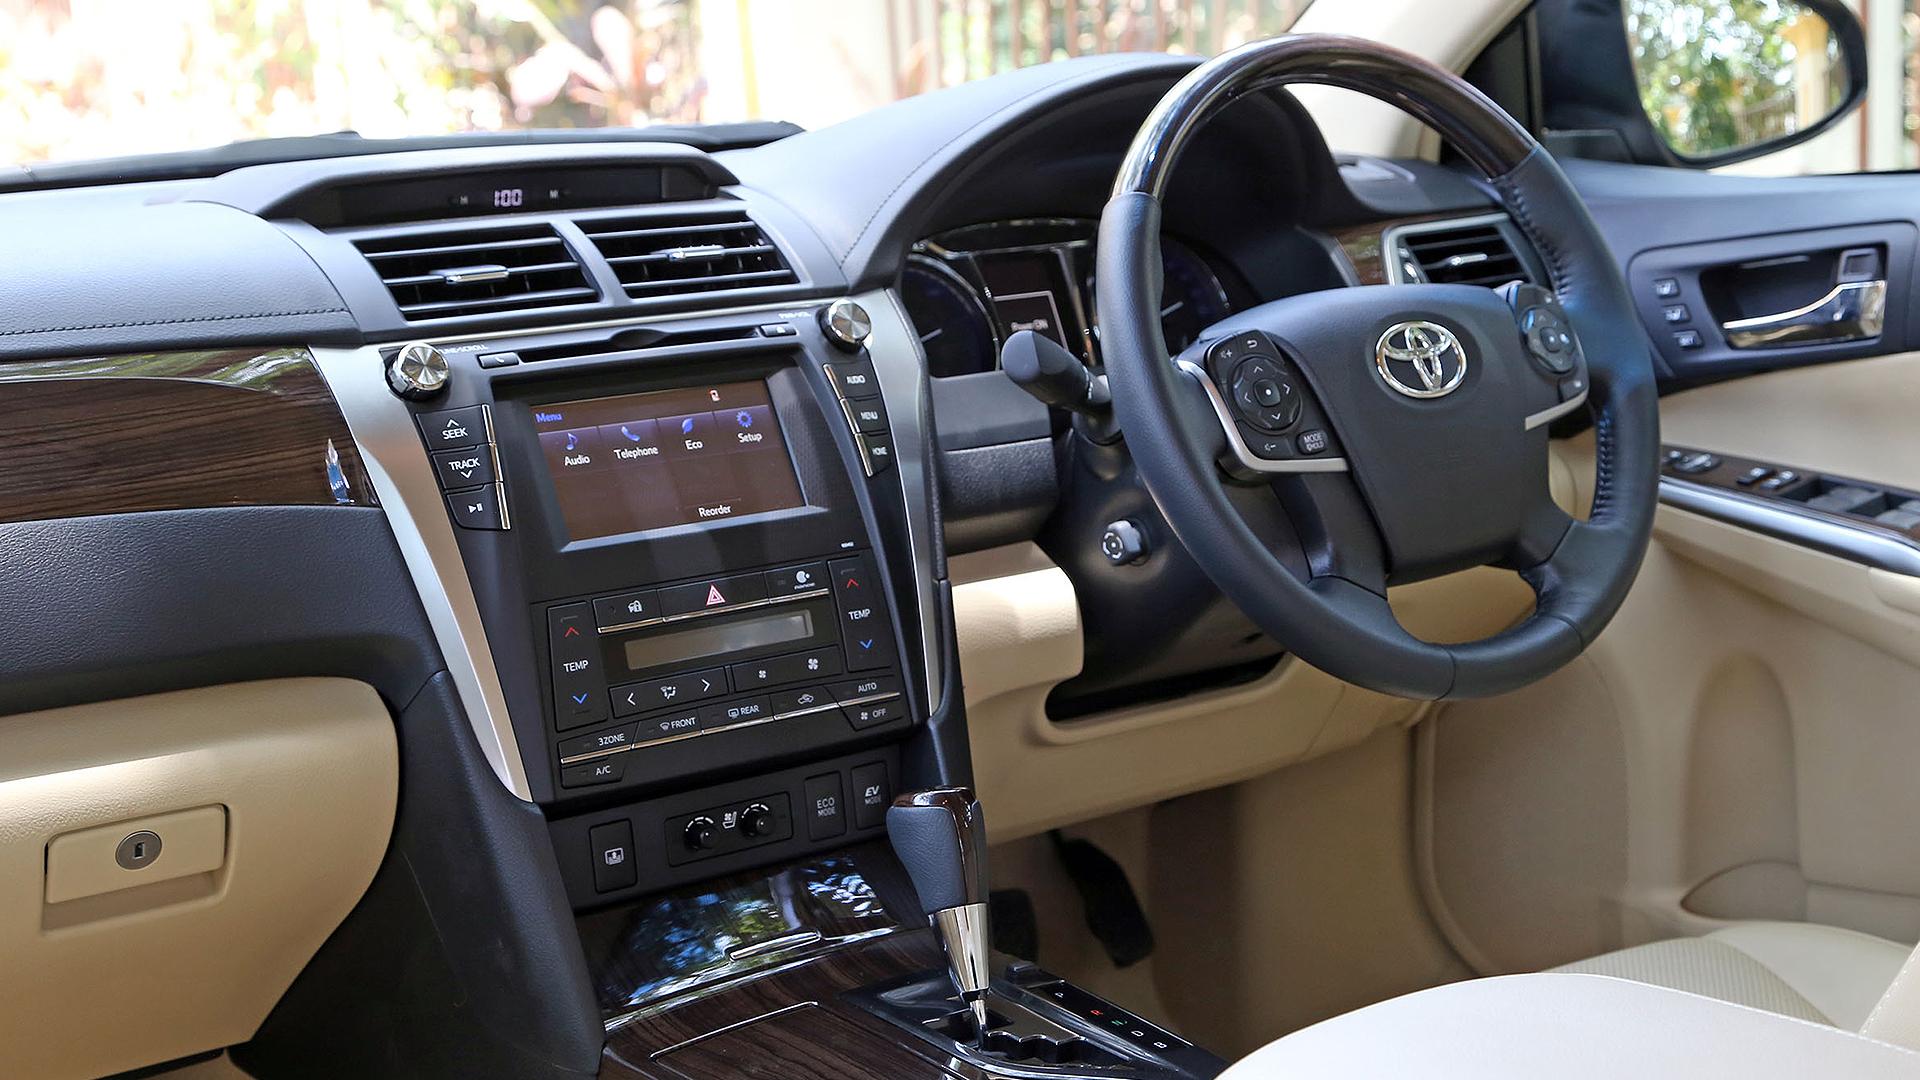 Toyota Camry 2015 Hybrid Exterior